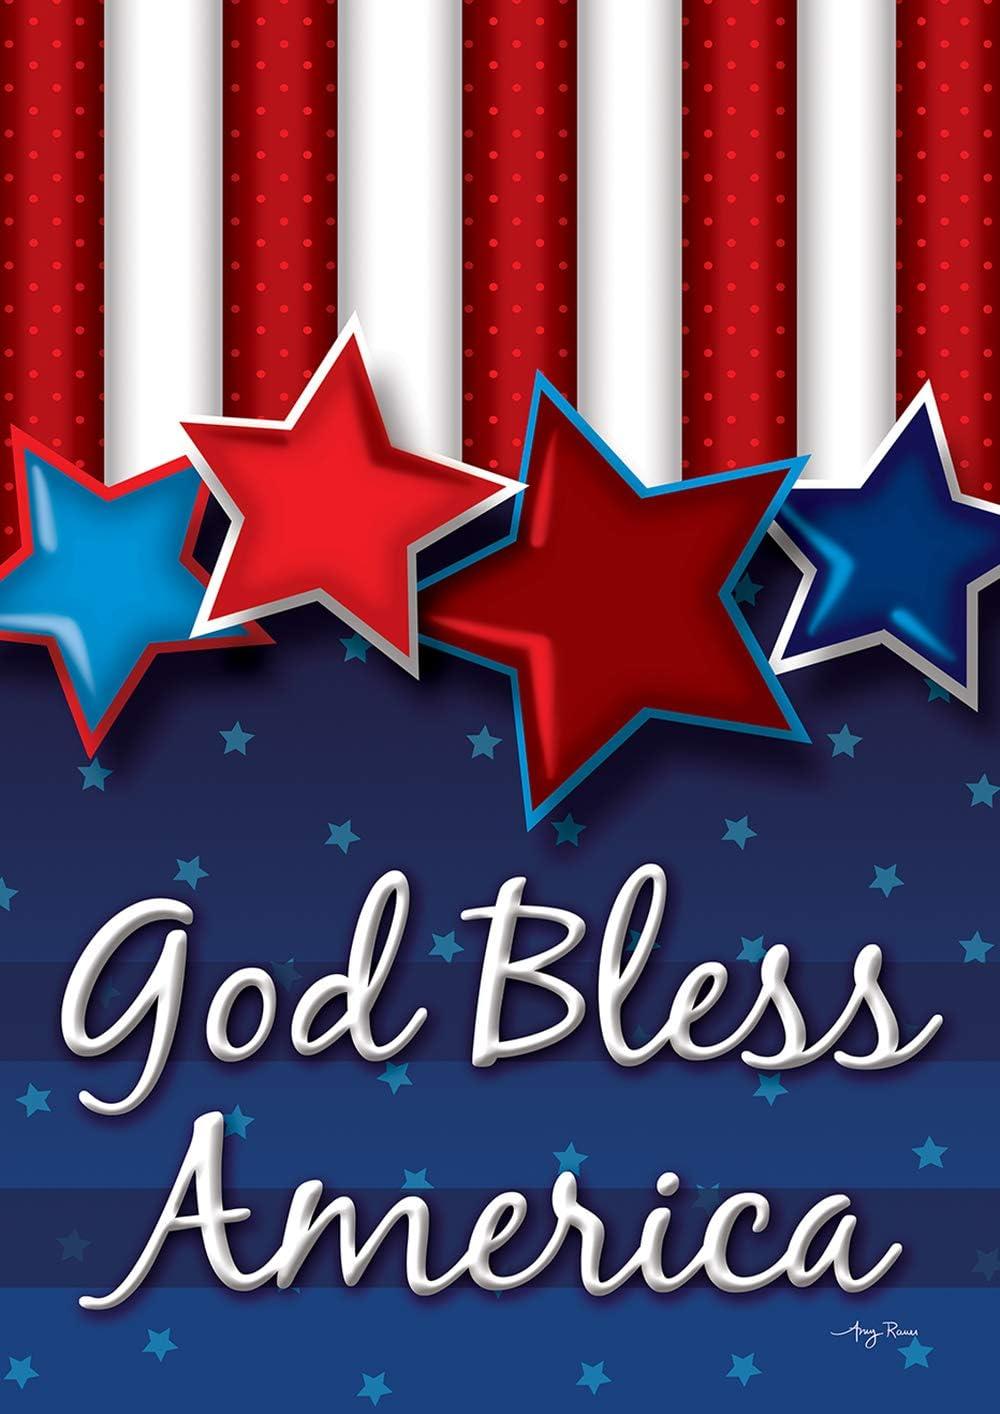 "Toland Home Garden 1112384 God Bless America Stars 12.5 x 18 Inch Decorative, Garden Flag (12.5"" x 18""),"